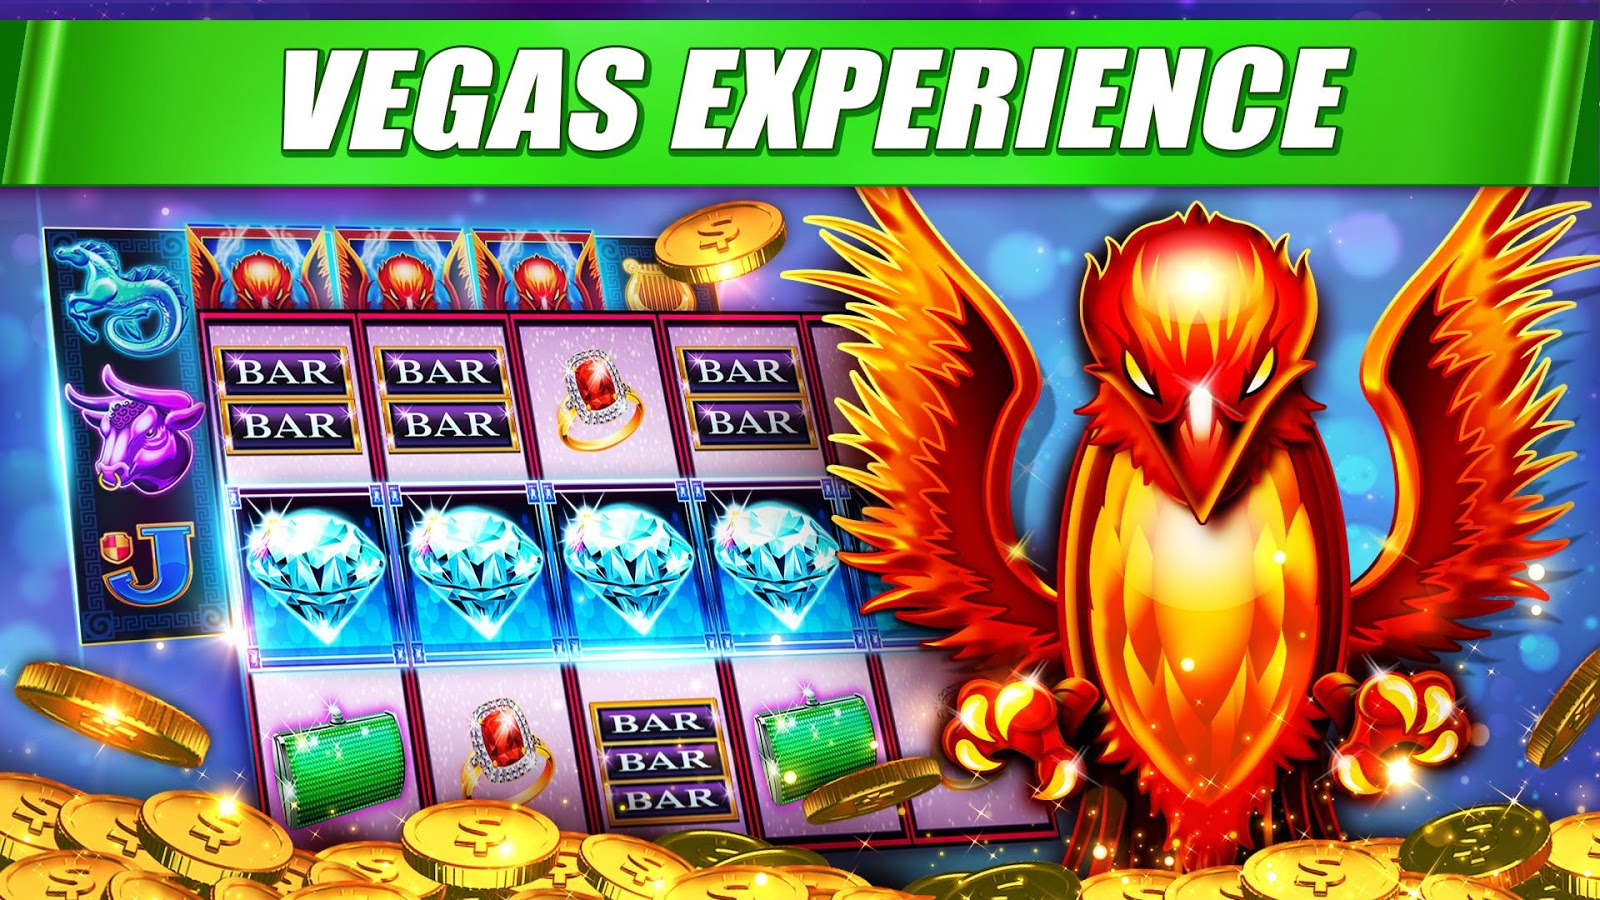 Gratis turnering casino - 52895